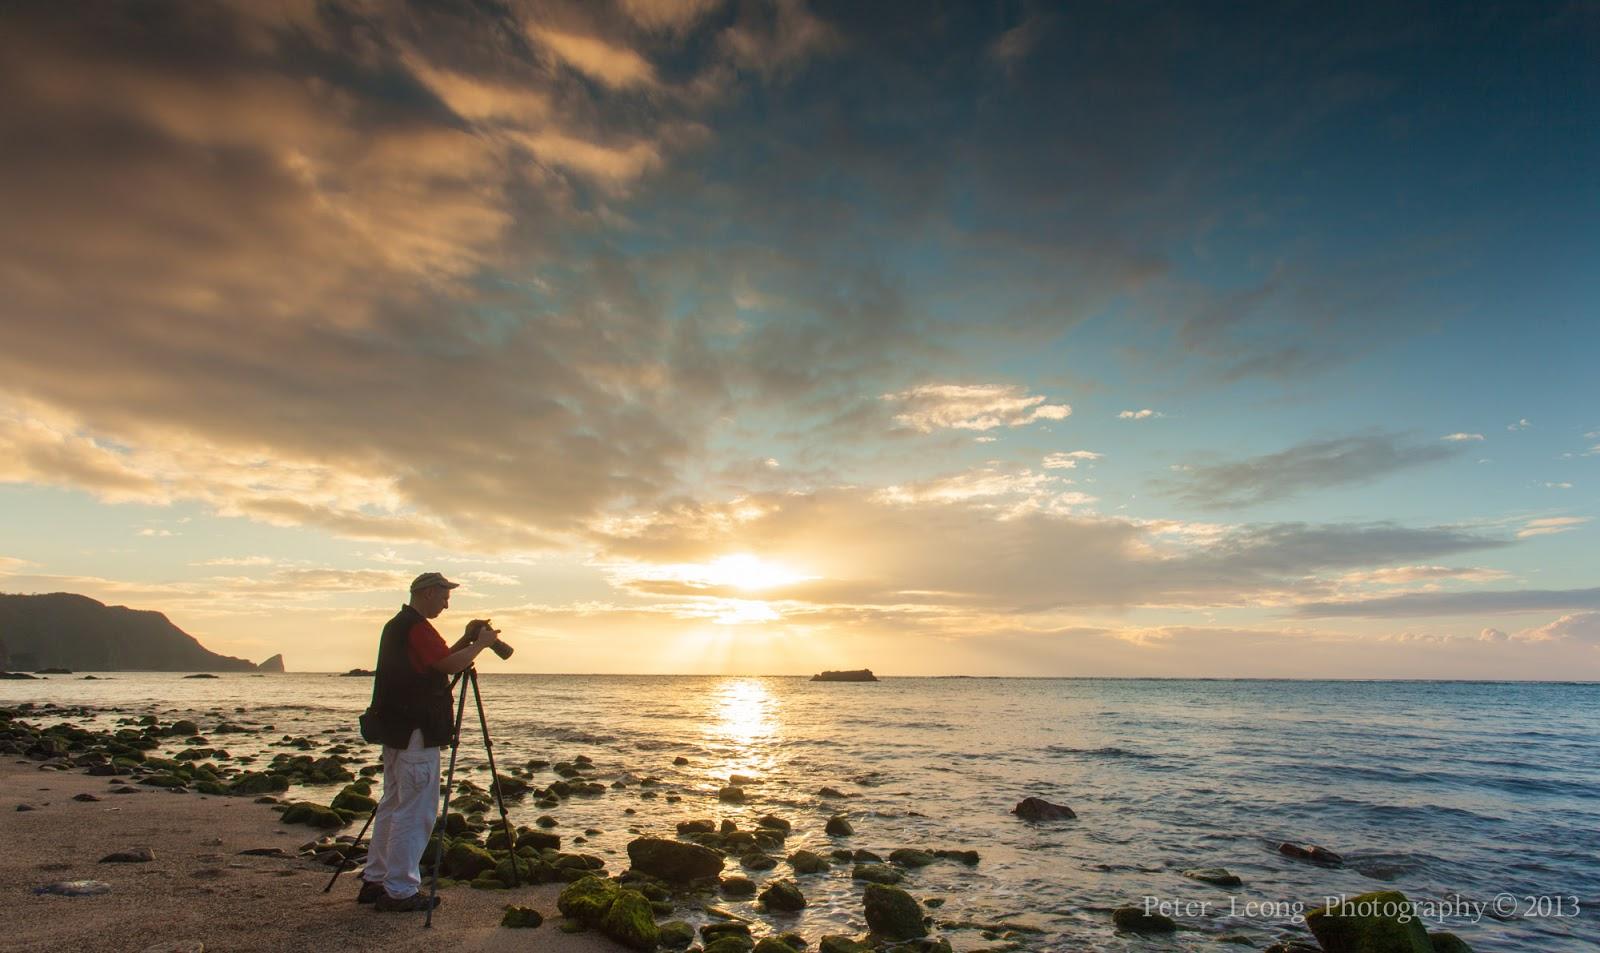 Okinawa wedding photographer pete leong exploring the northern east